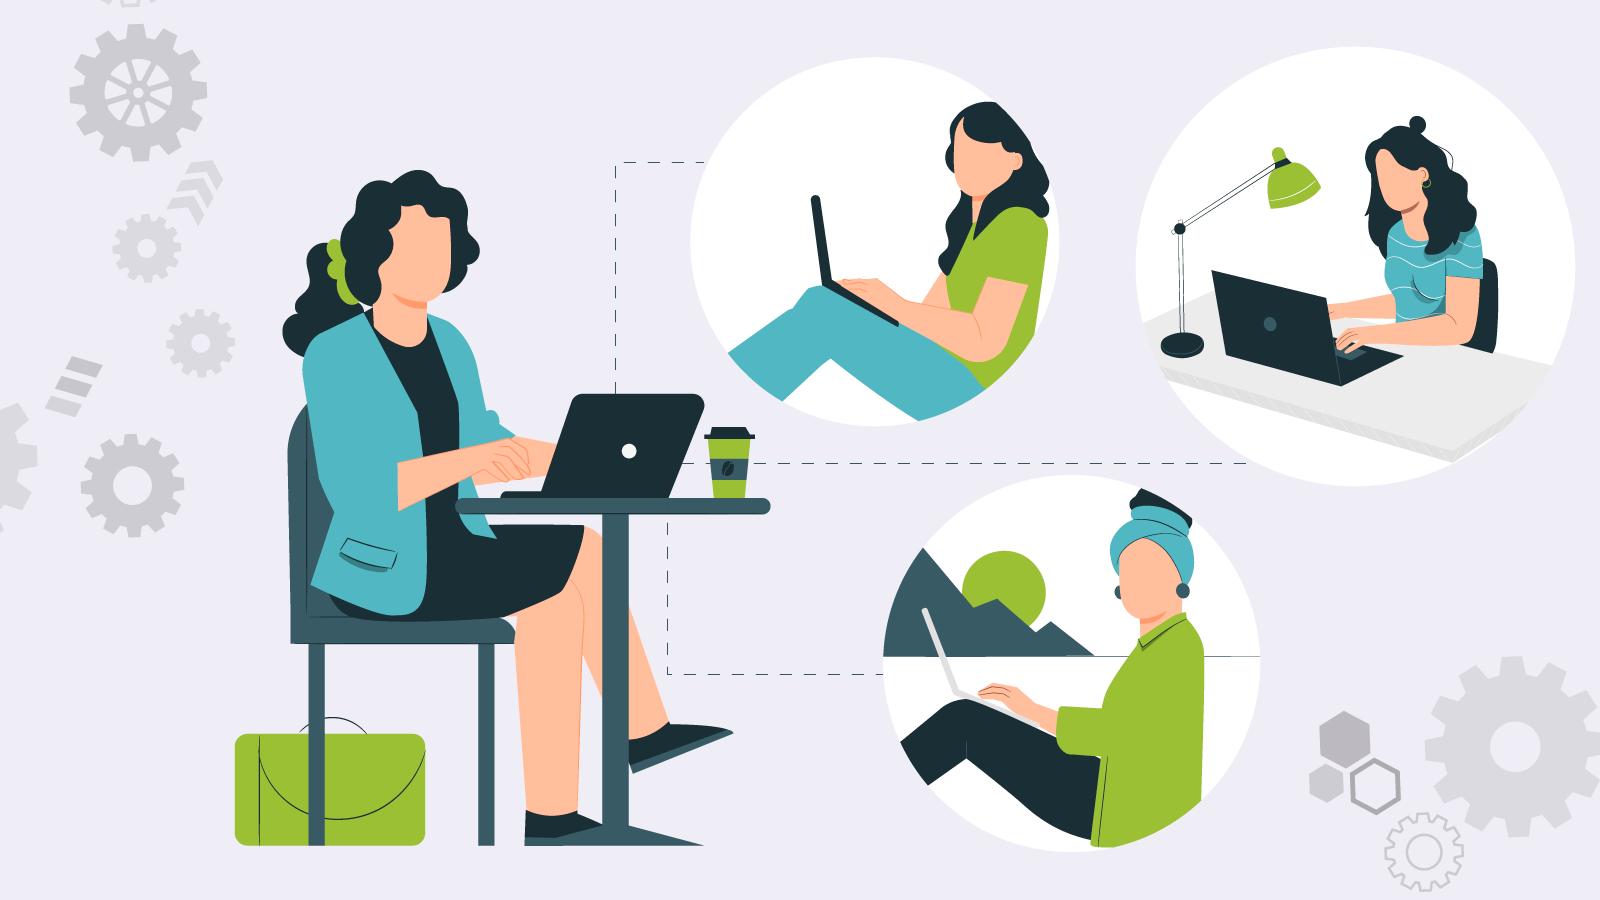 citrix-workspace-usuarios-finales